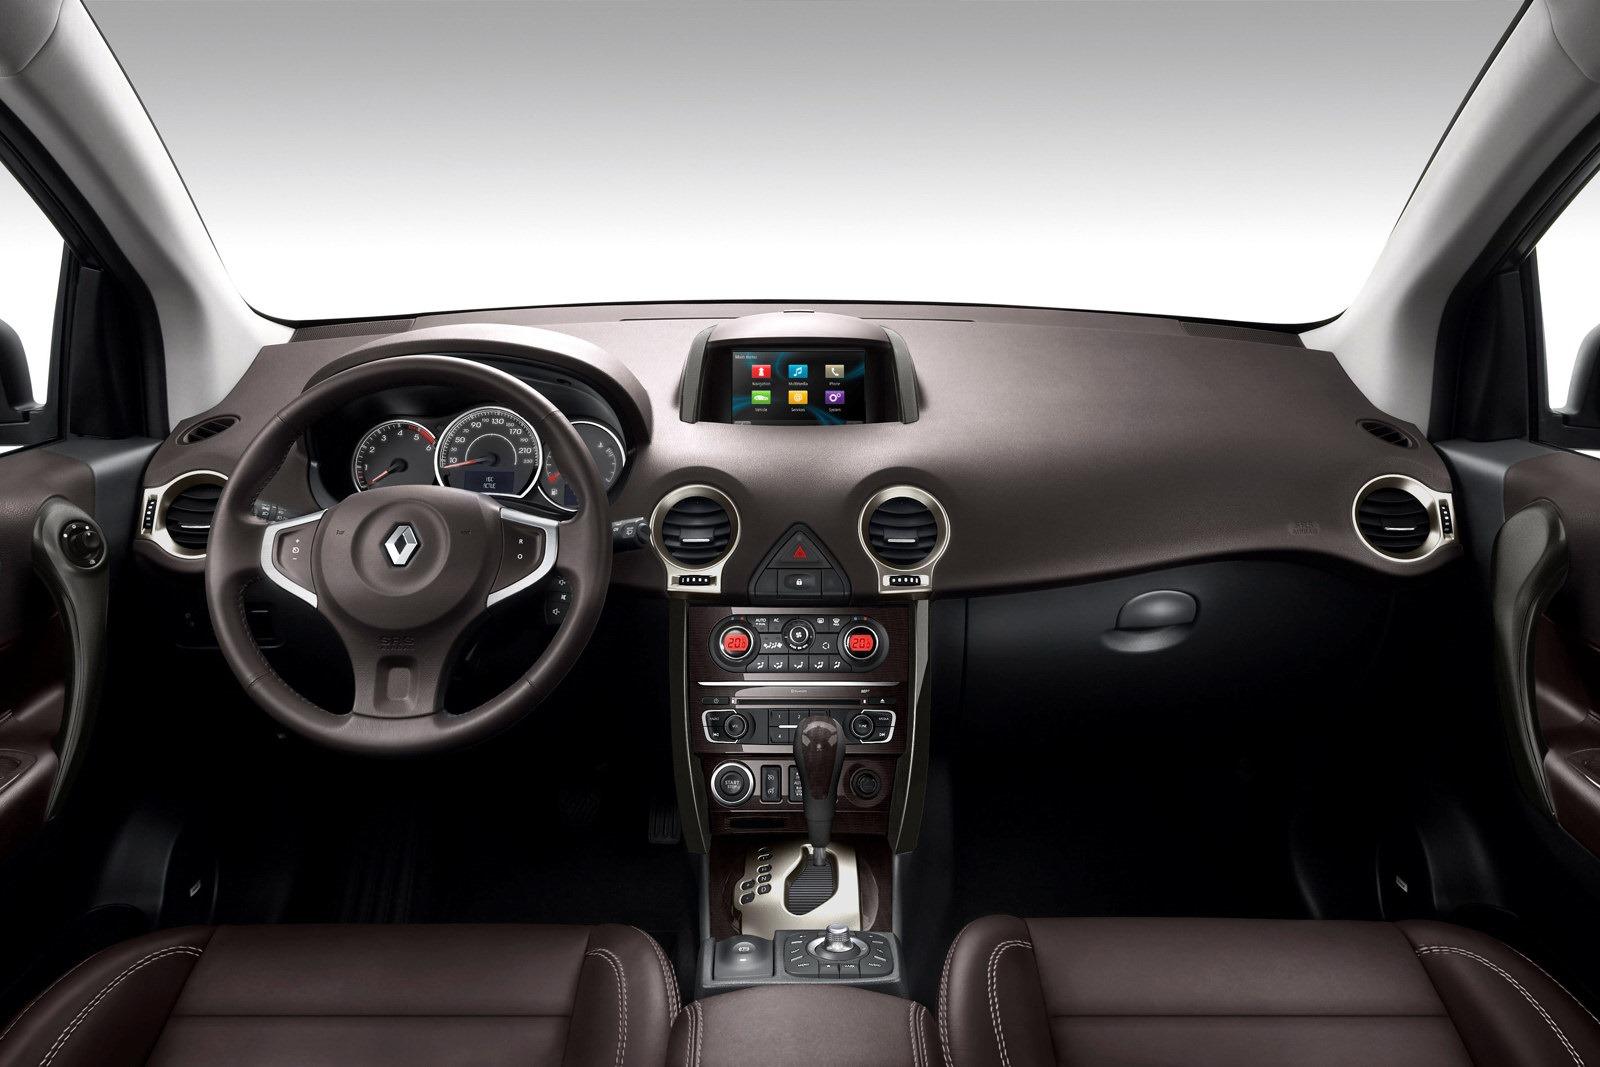 Renault Koleos Gets Another Refresh